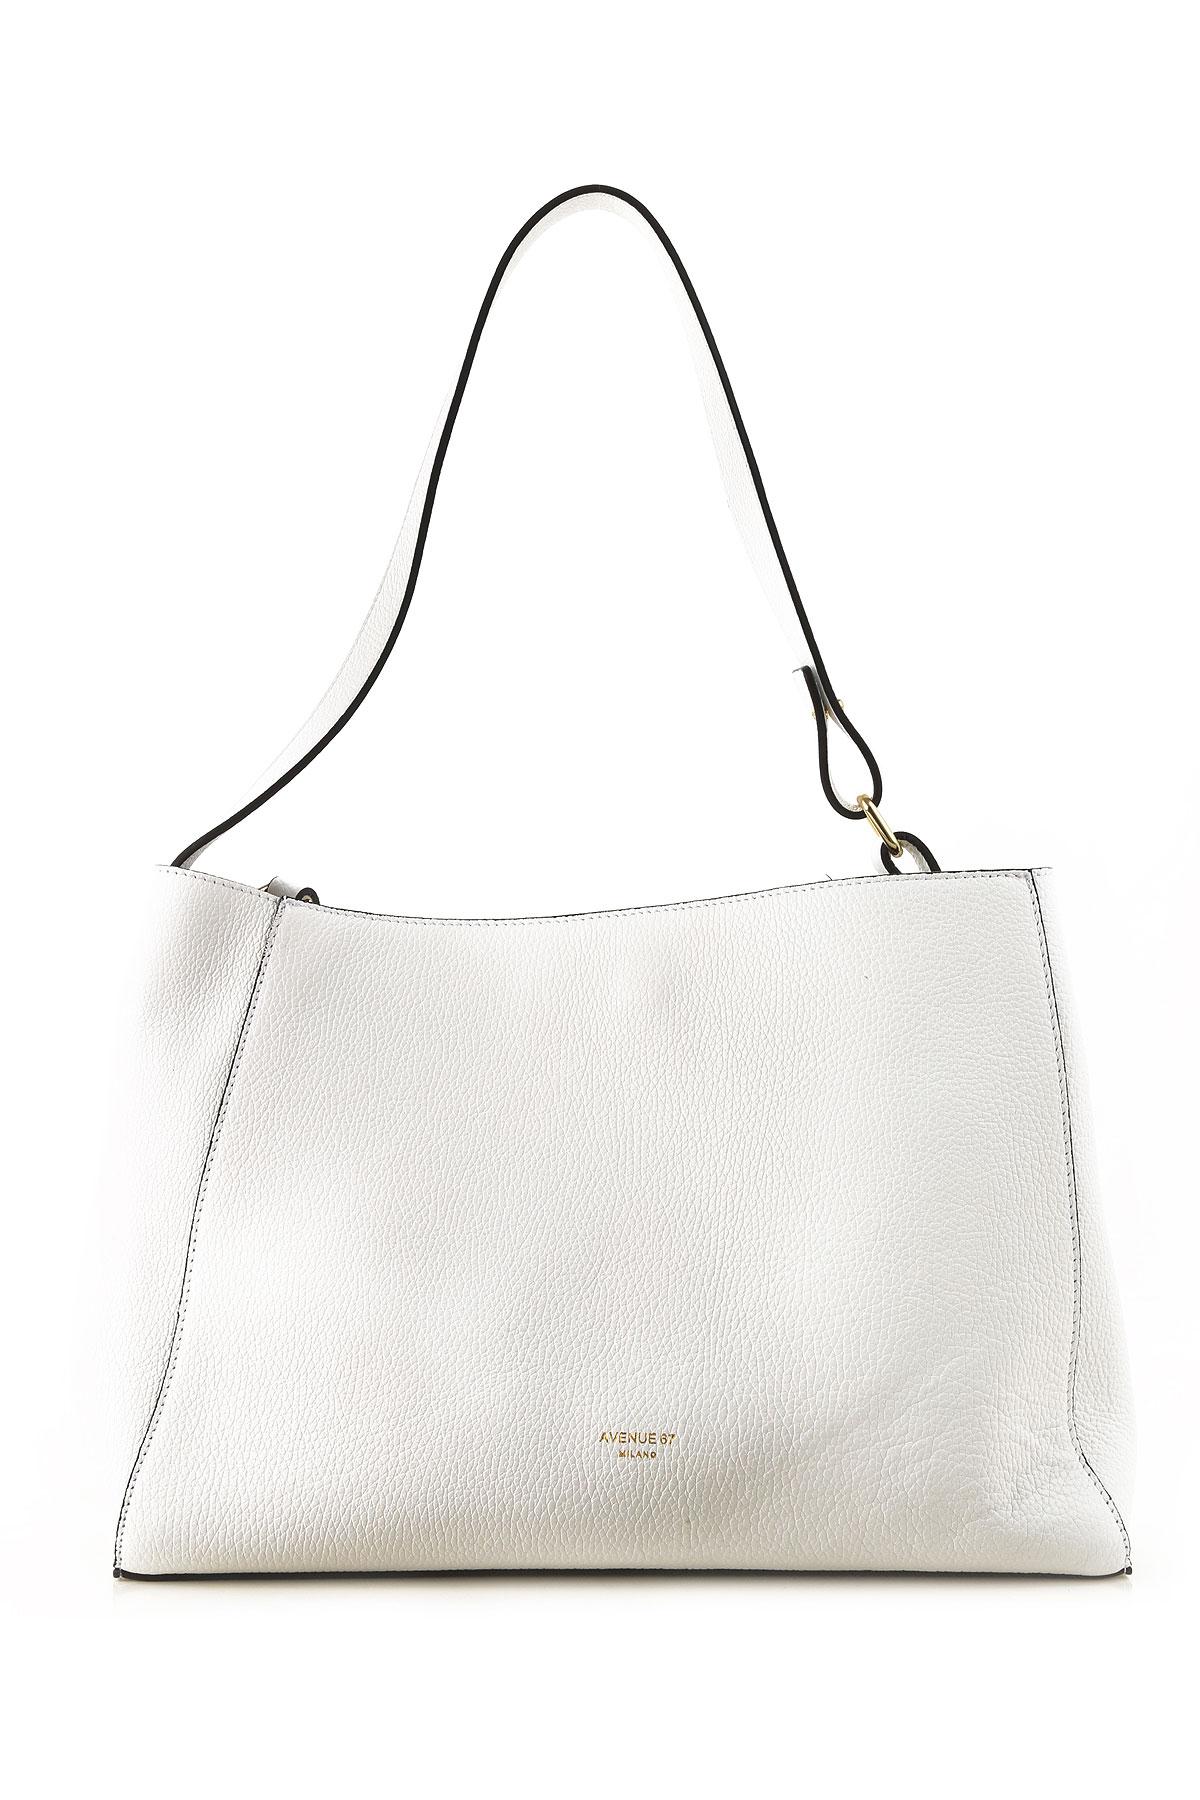 Avenue 67 Tote Bag On Sale, White, Leather, 2019